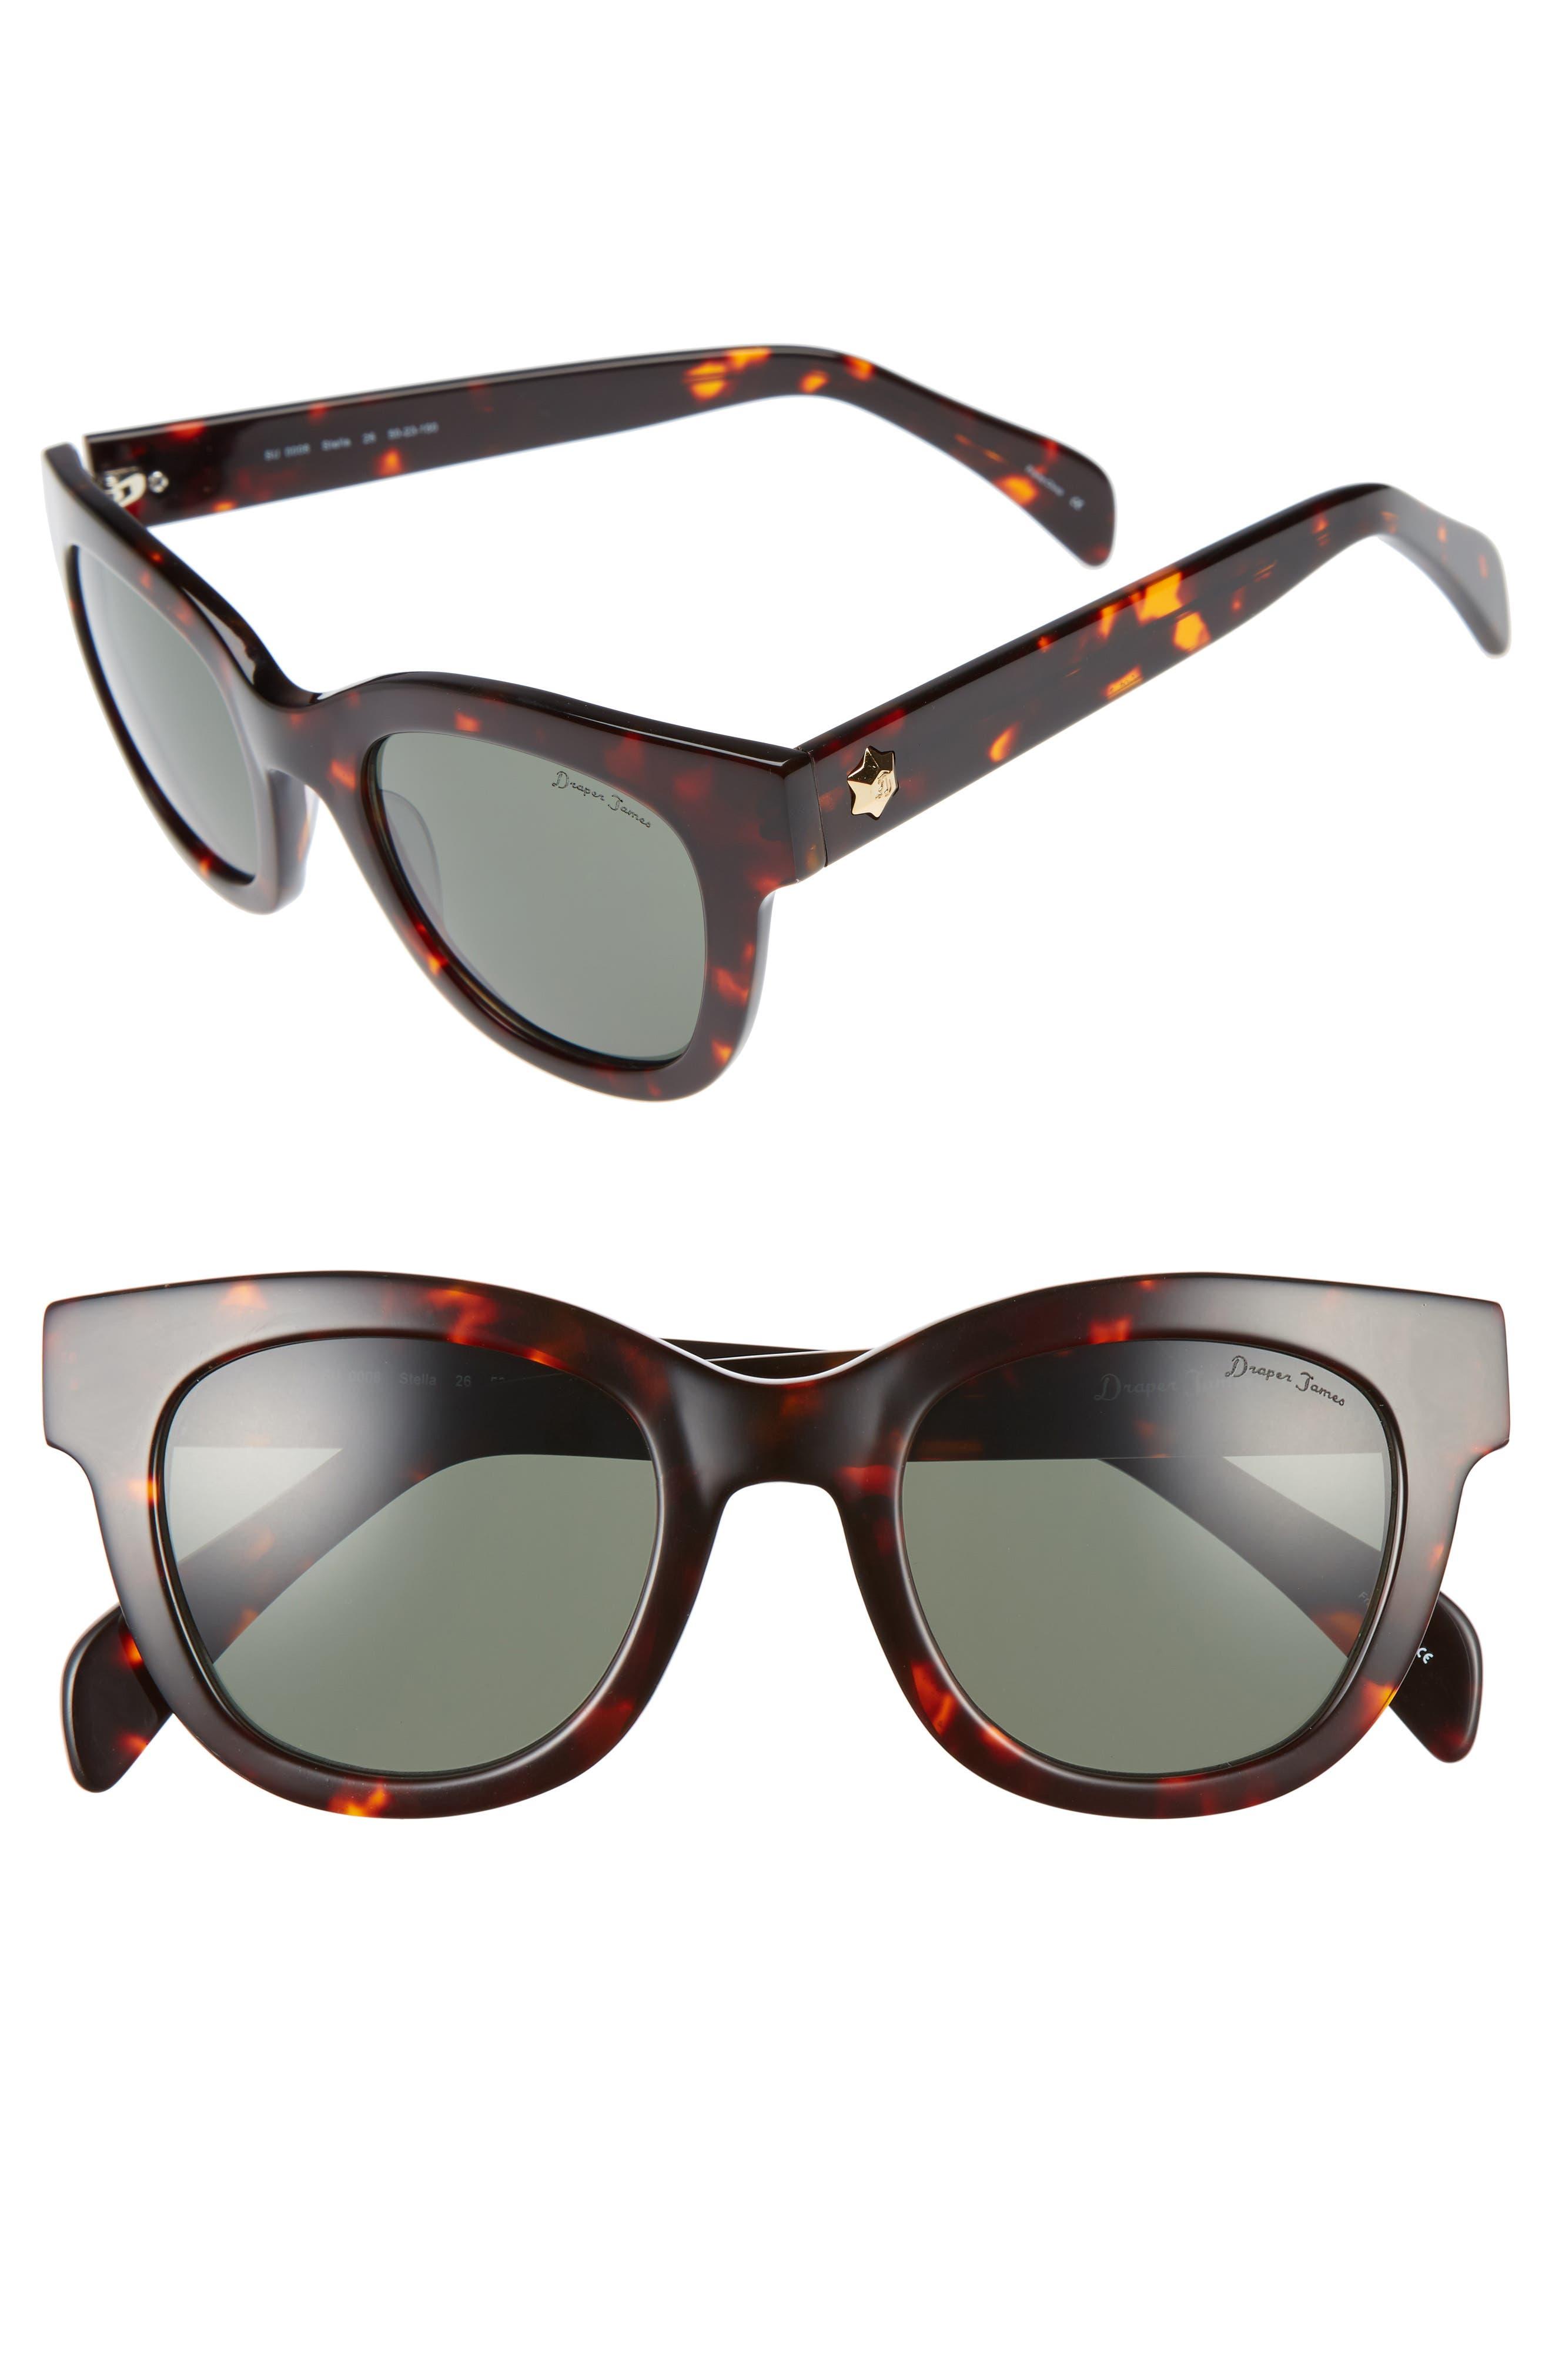 Main Image - Draper James 50mm Gradient Lens Cat Eye Sunglasses